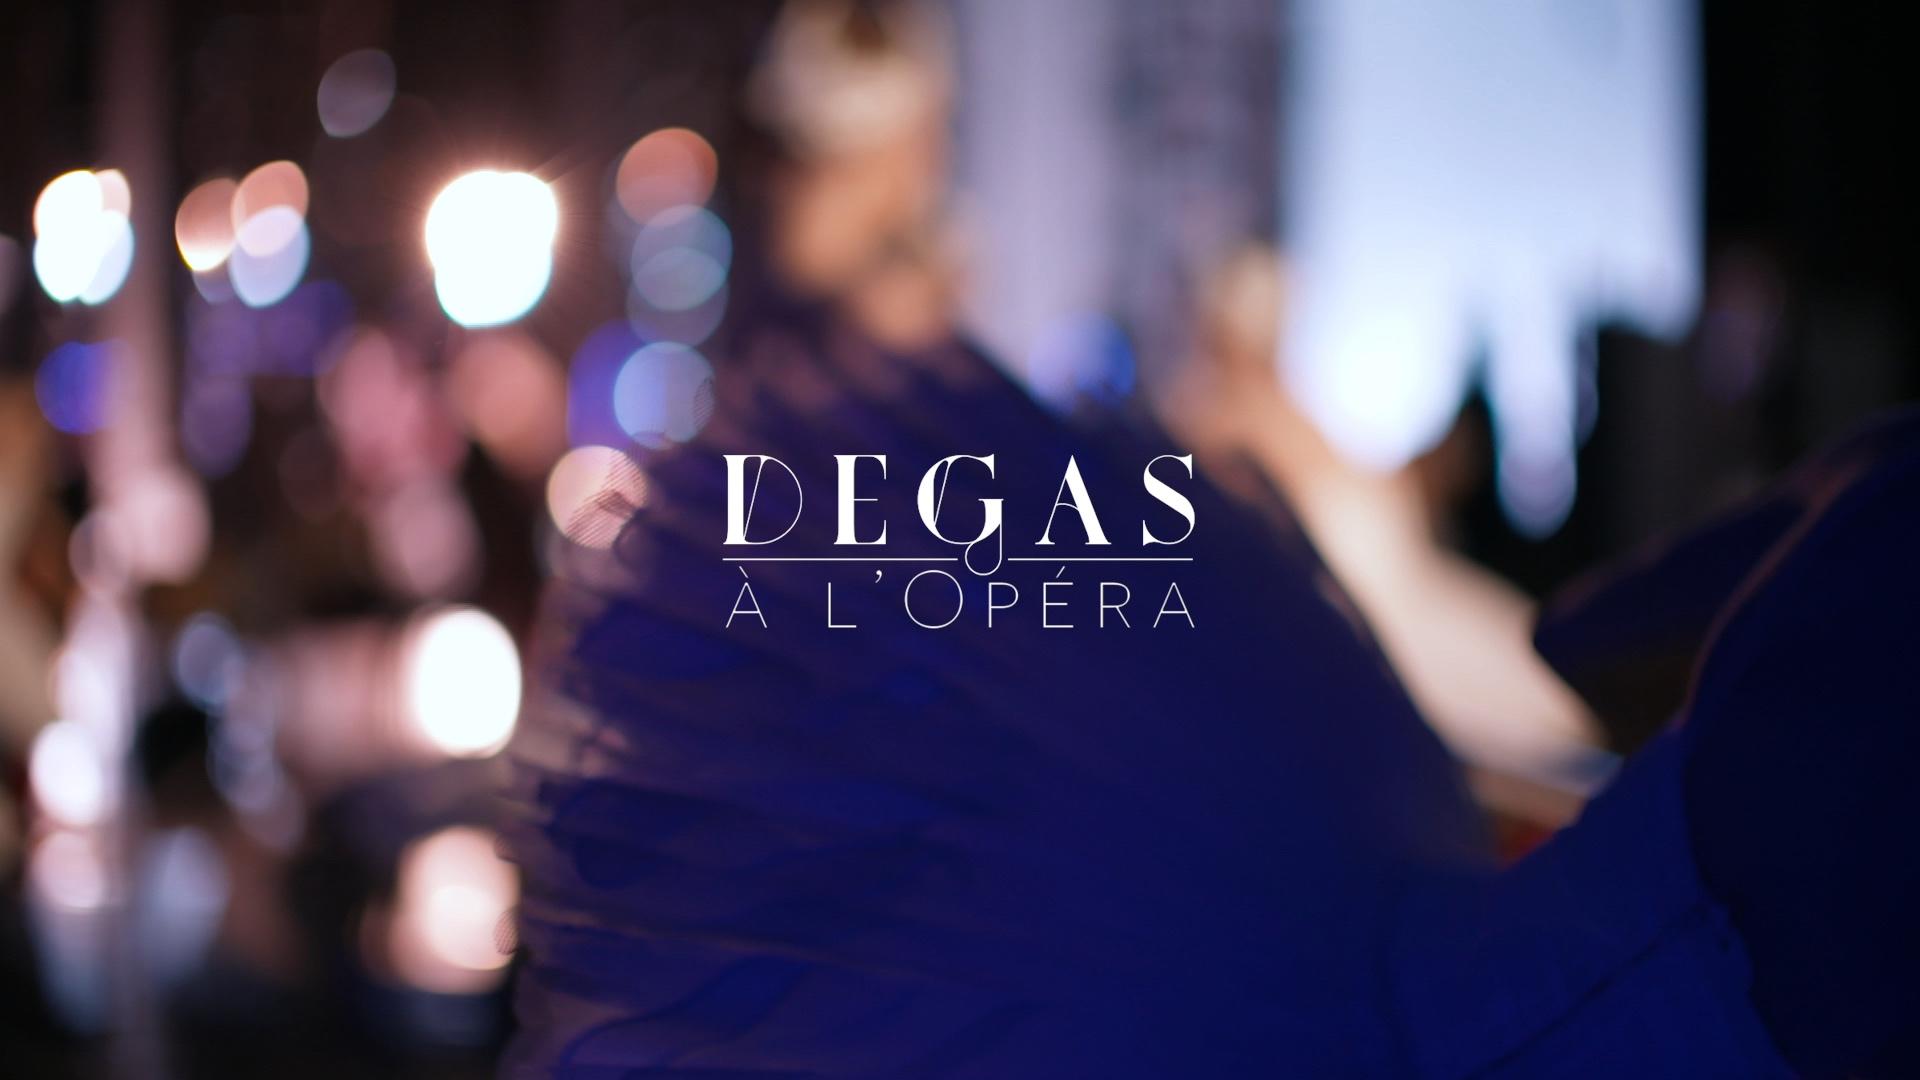 Degas à l'Opéra - Blandine Armand - Documentaires